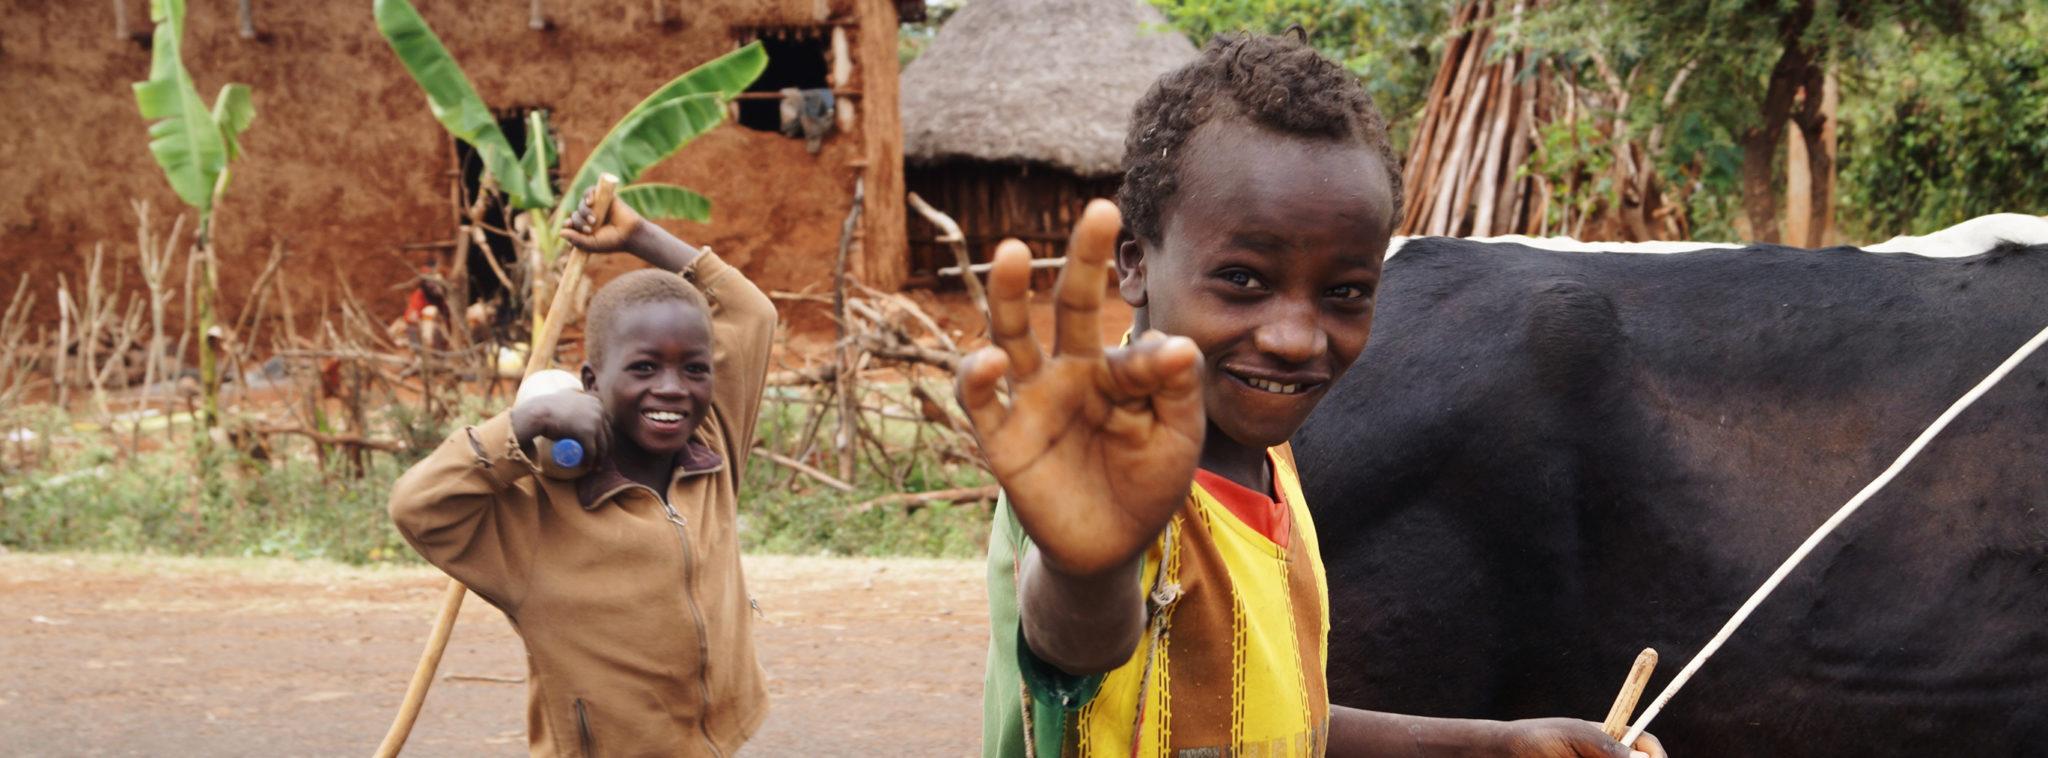 Southern-Ethiopia-Human-Zoo-Jinka-Kids-Slider